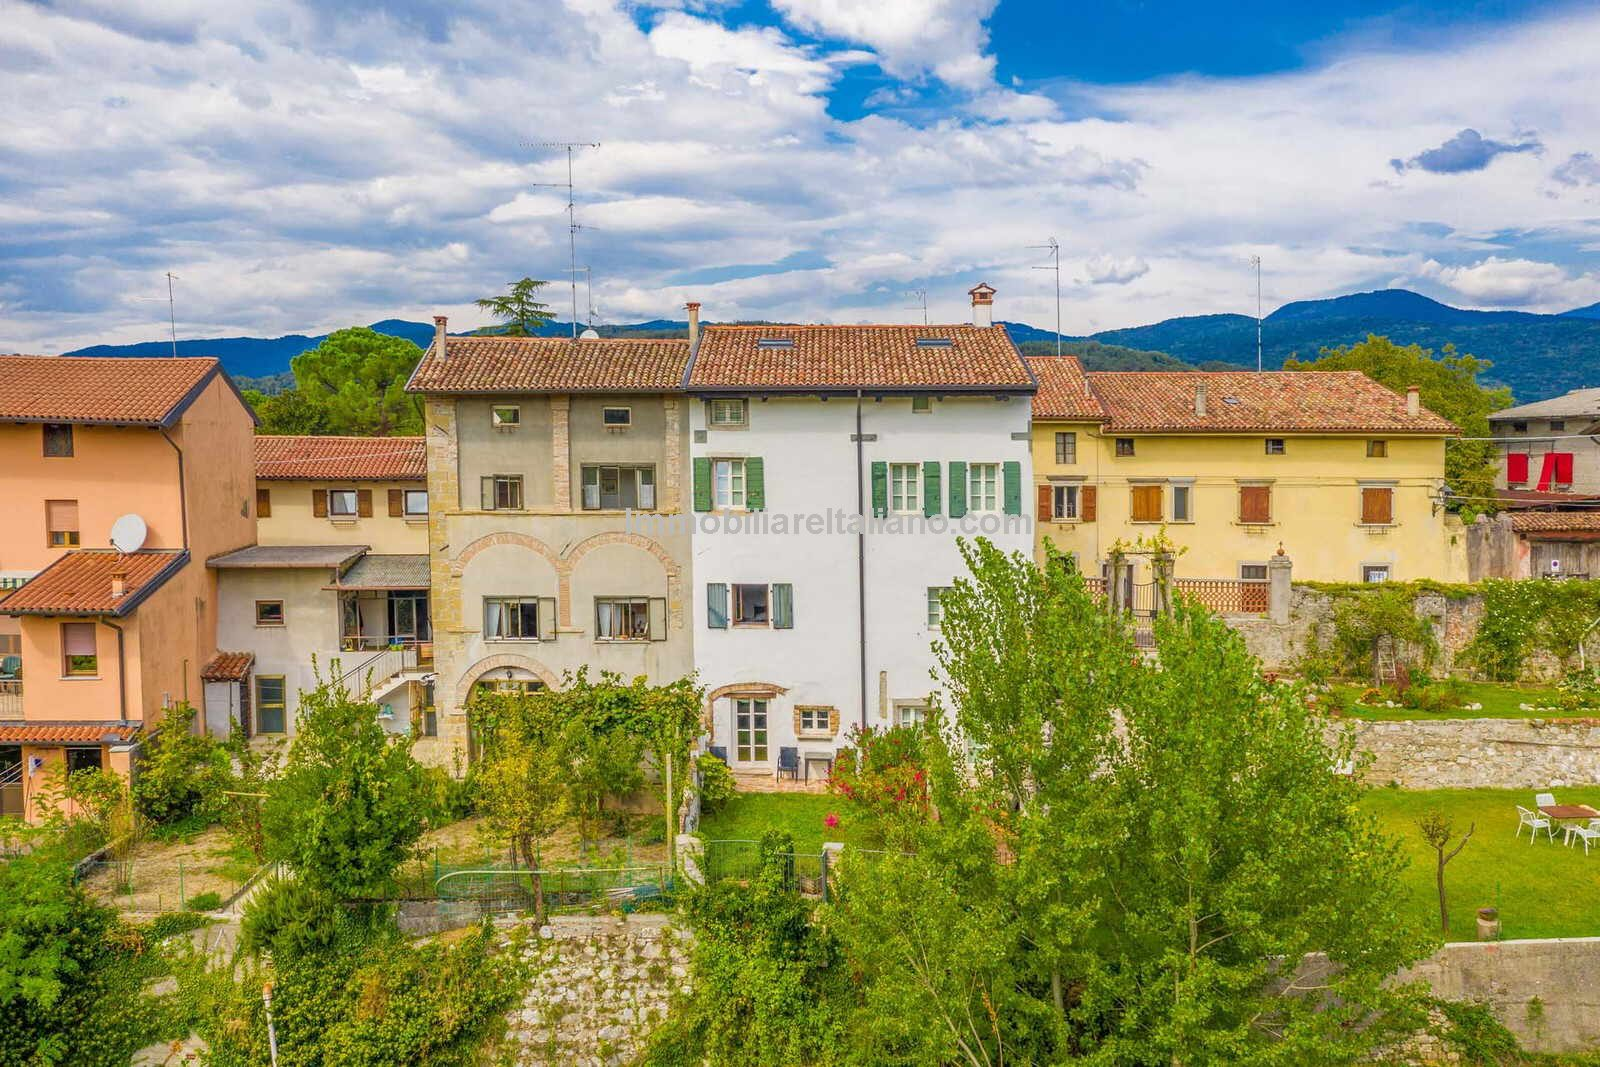 Friuli-Venezia Giulia home or holiday investment property